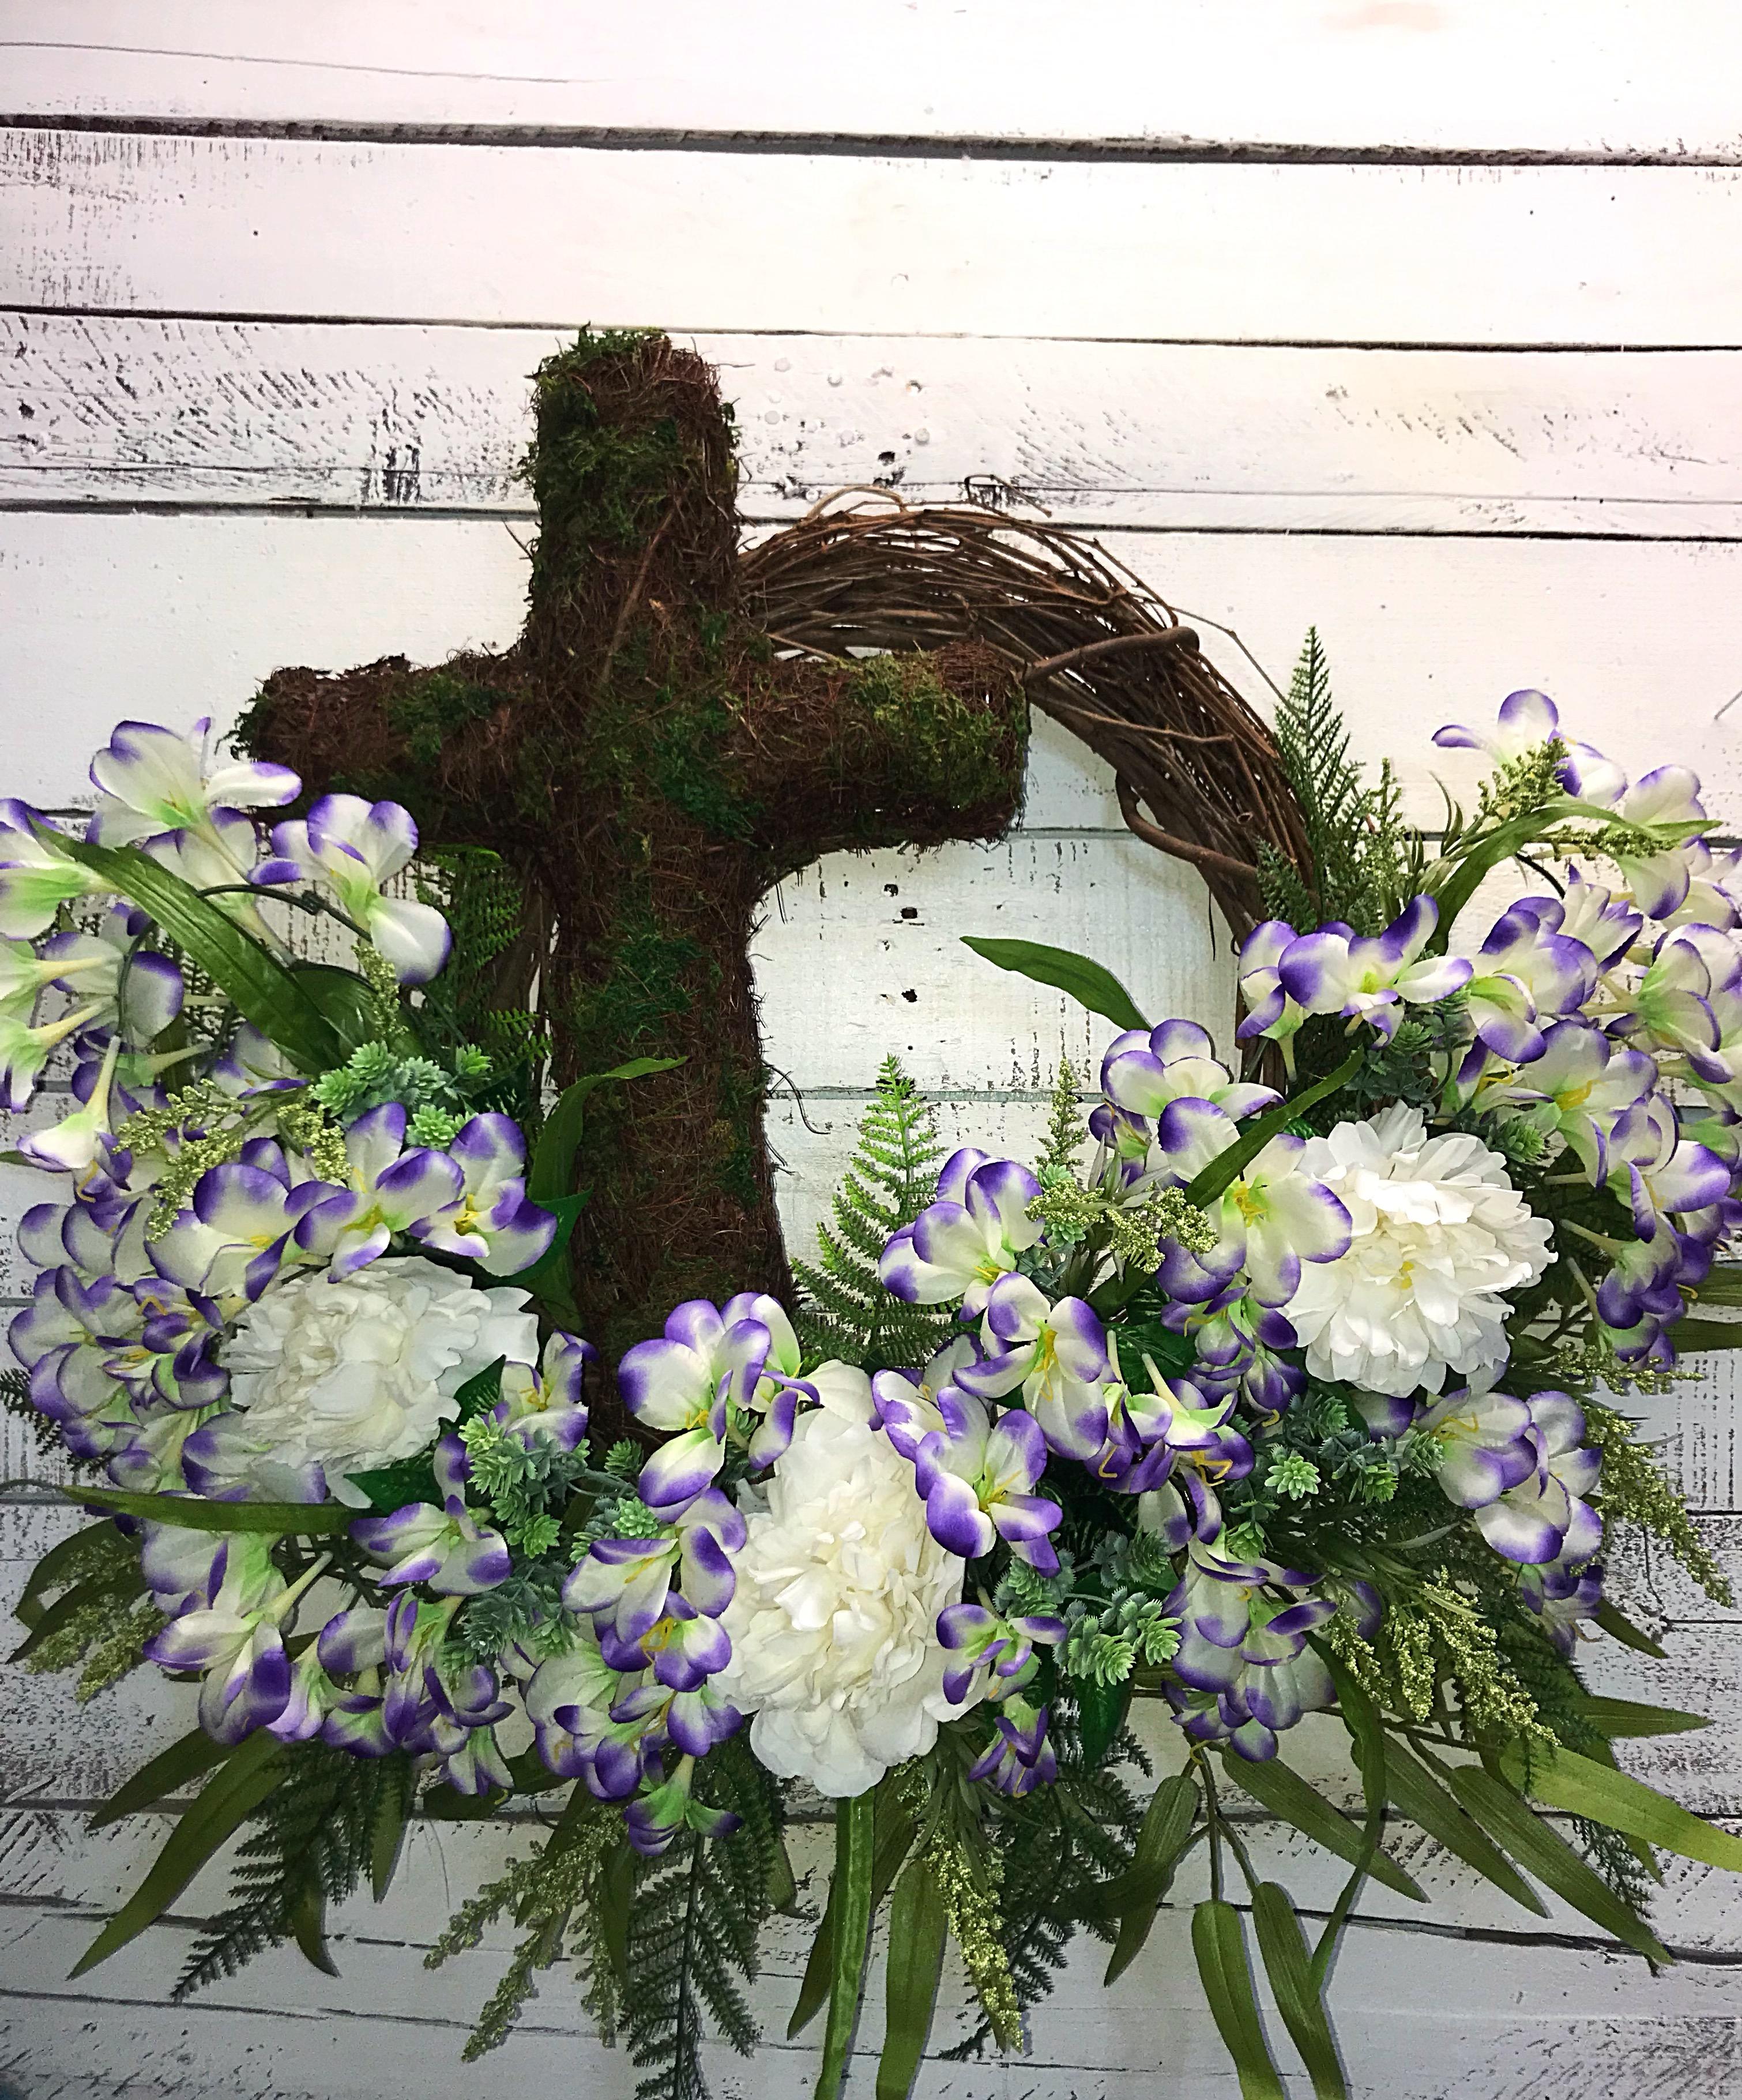 Cross Wreath, Spring Wreath, Condolences, Summer Wreath, Memorial Wreath,  Funeral Wreath, Purple Freesia, Purple Cross Wreath for Spring, Moss Cross